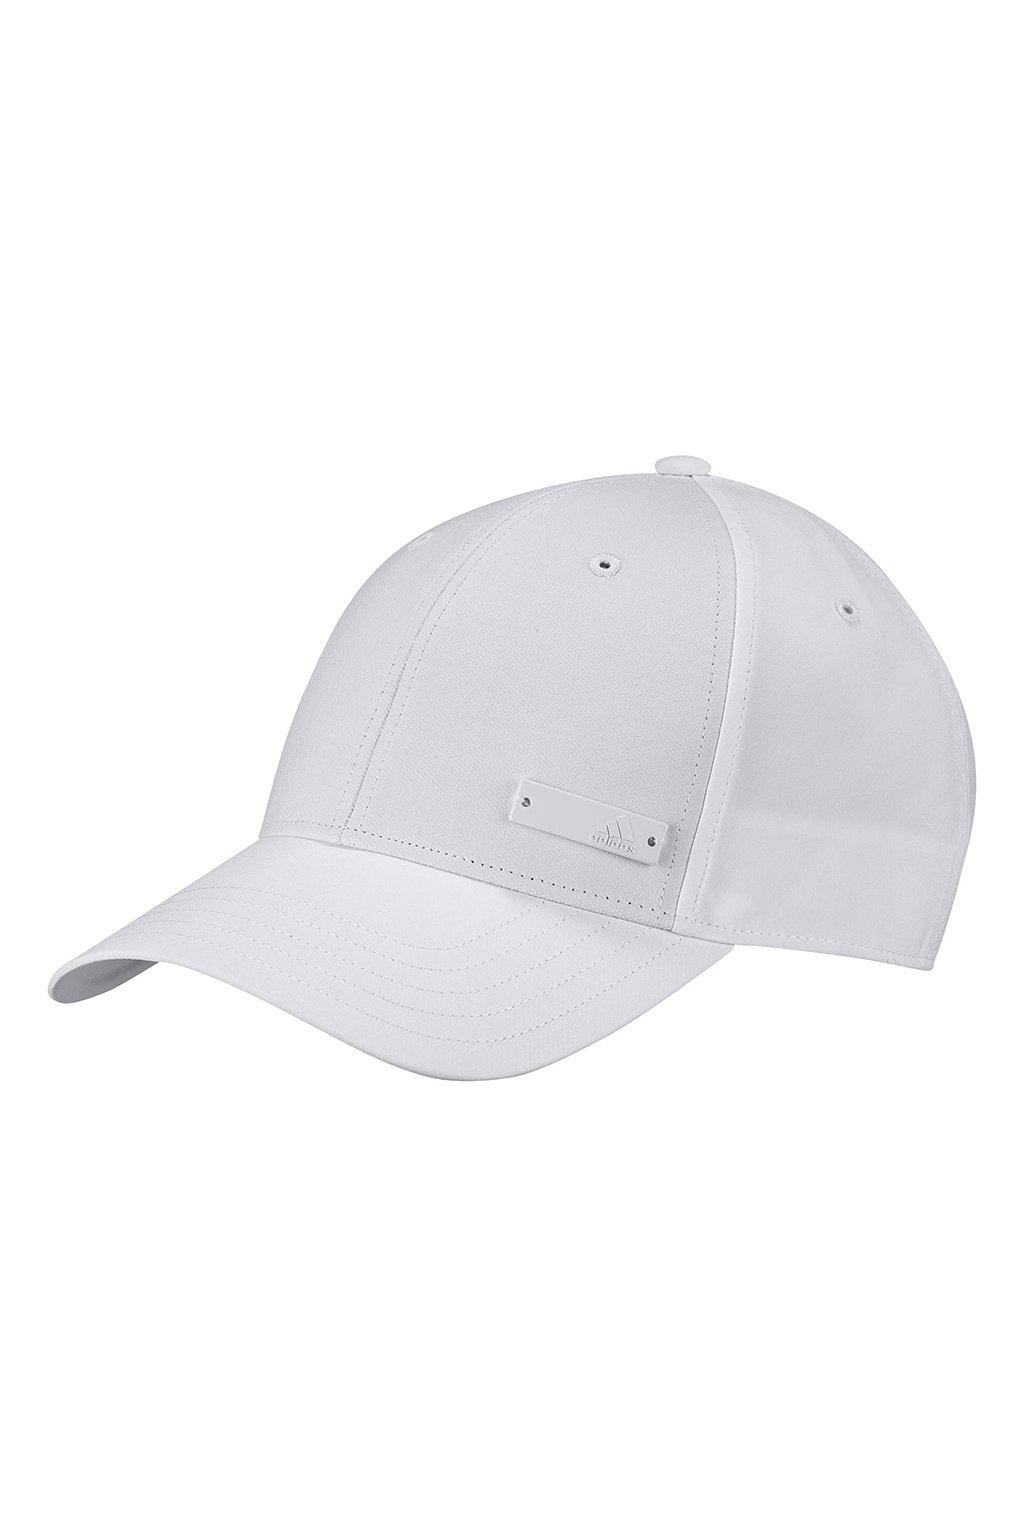 Dámska šiltovka Adidas Baseball Cap LT EMB OSFW biela FK0903